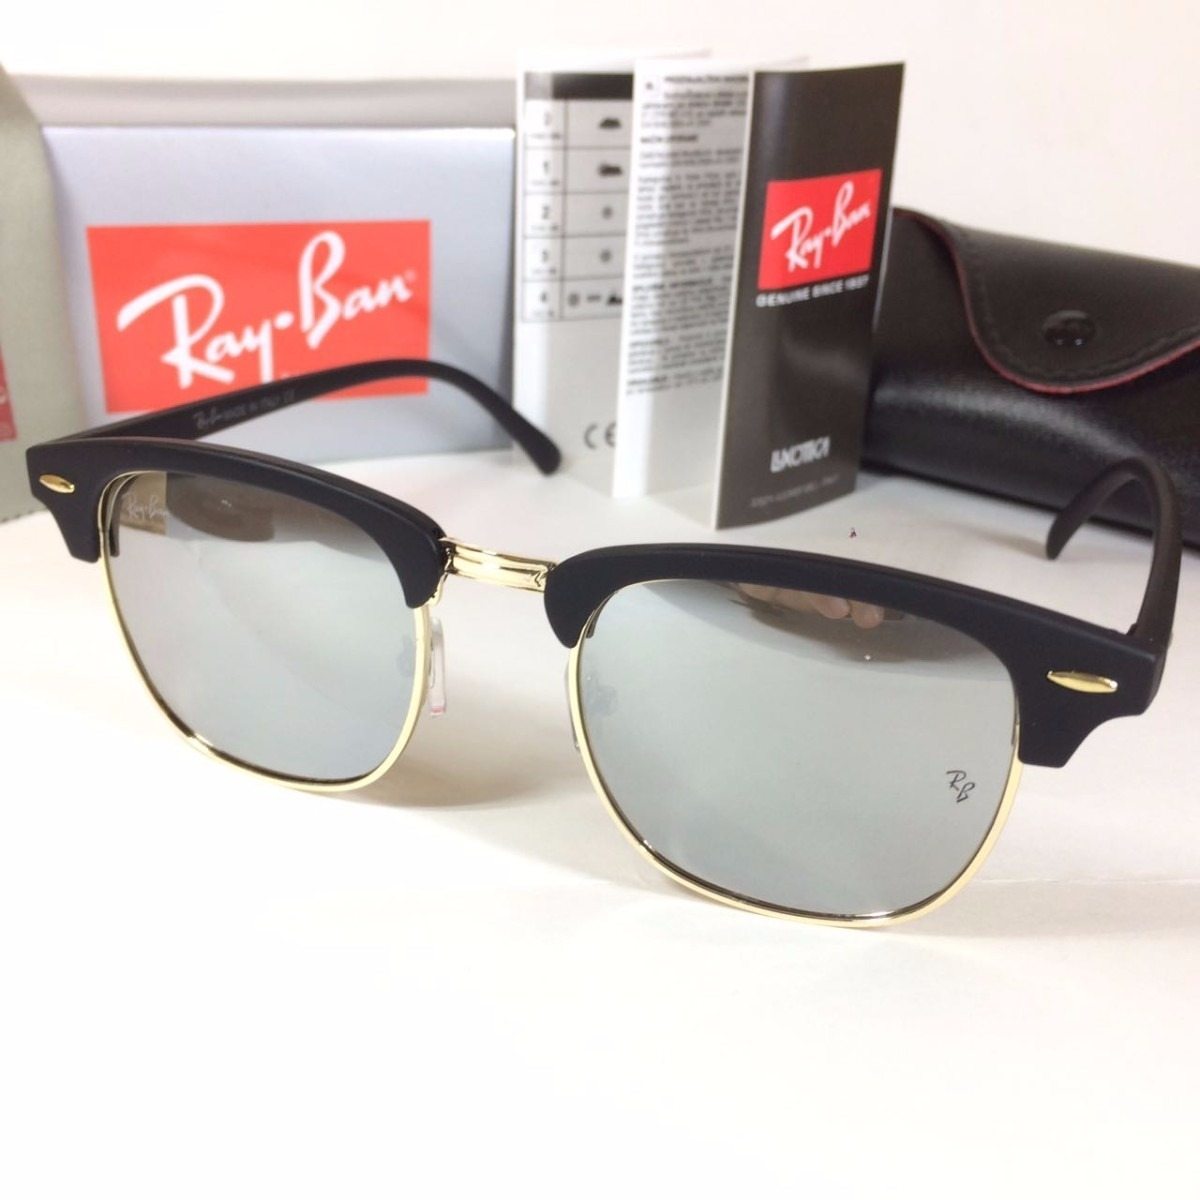 2d4b0f1397174 oculos de sol rayban clubmaster várias cores   envio 24 hs. Carregando zoom.